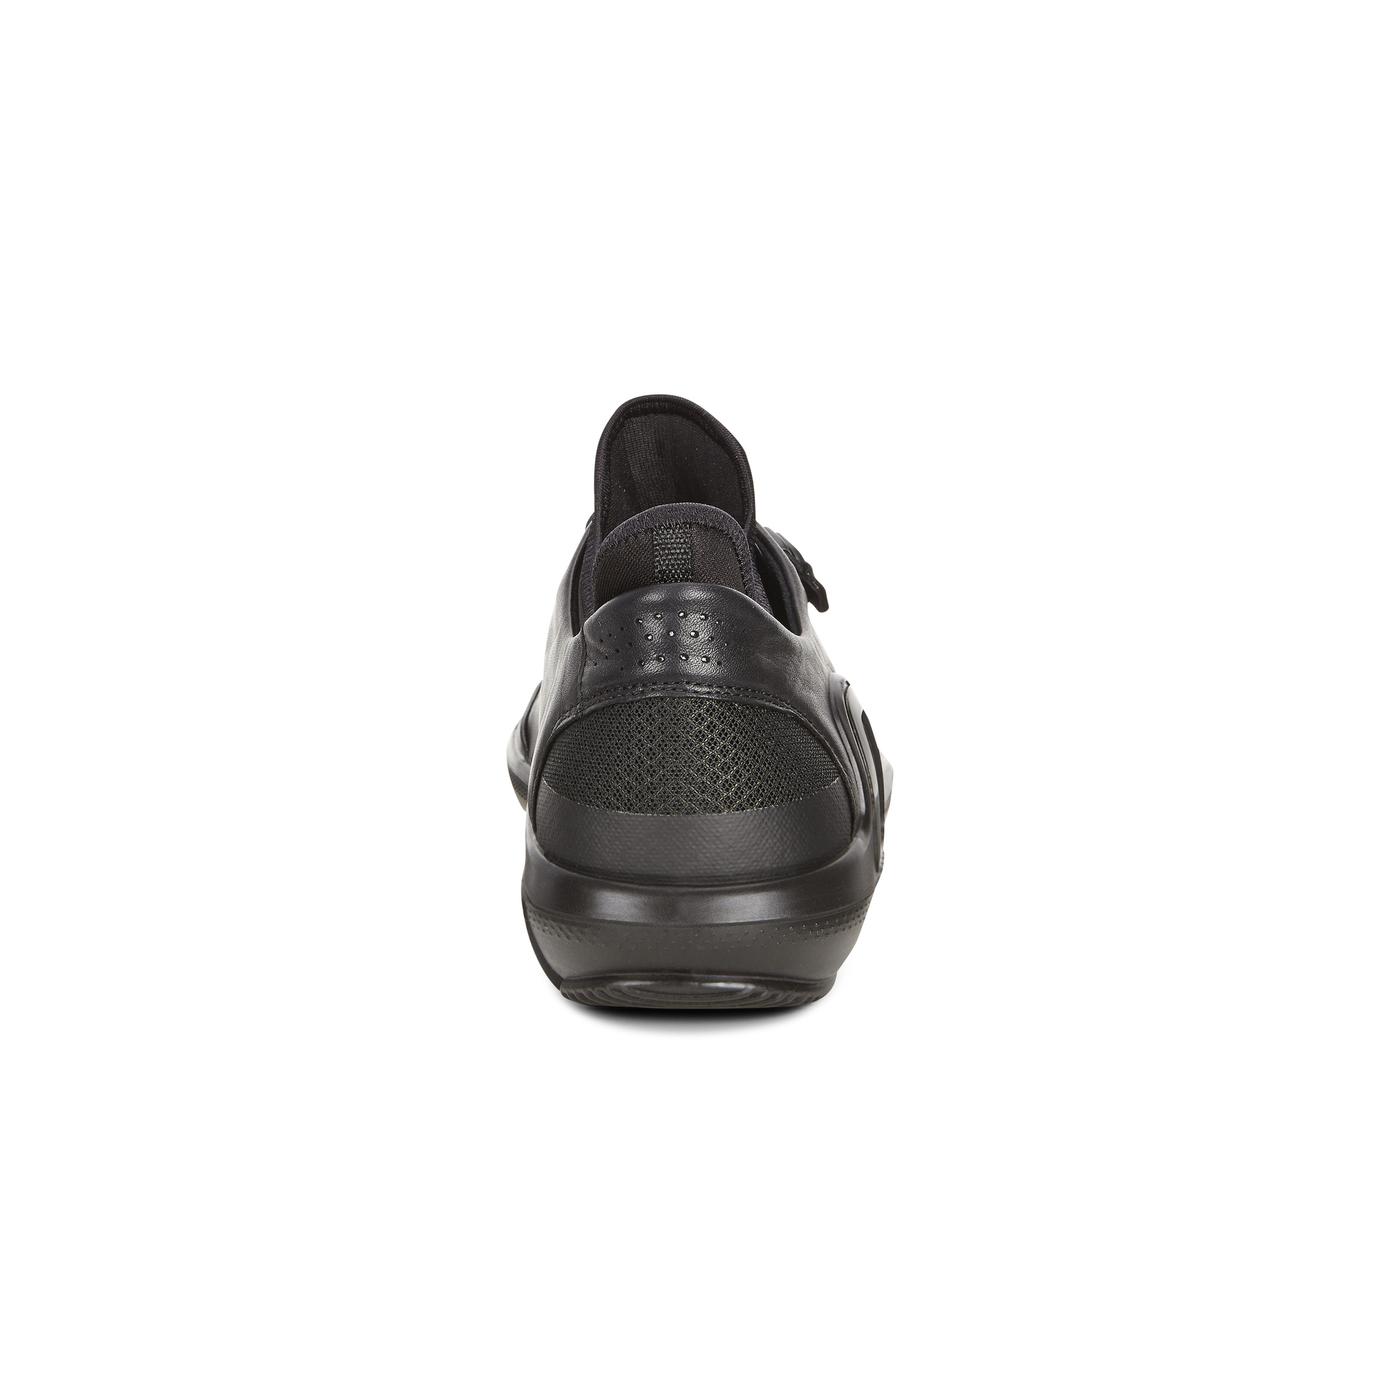 ECCO Mens Intrinsic 3 Leather